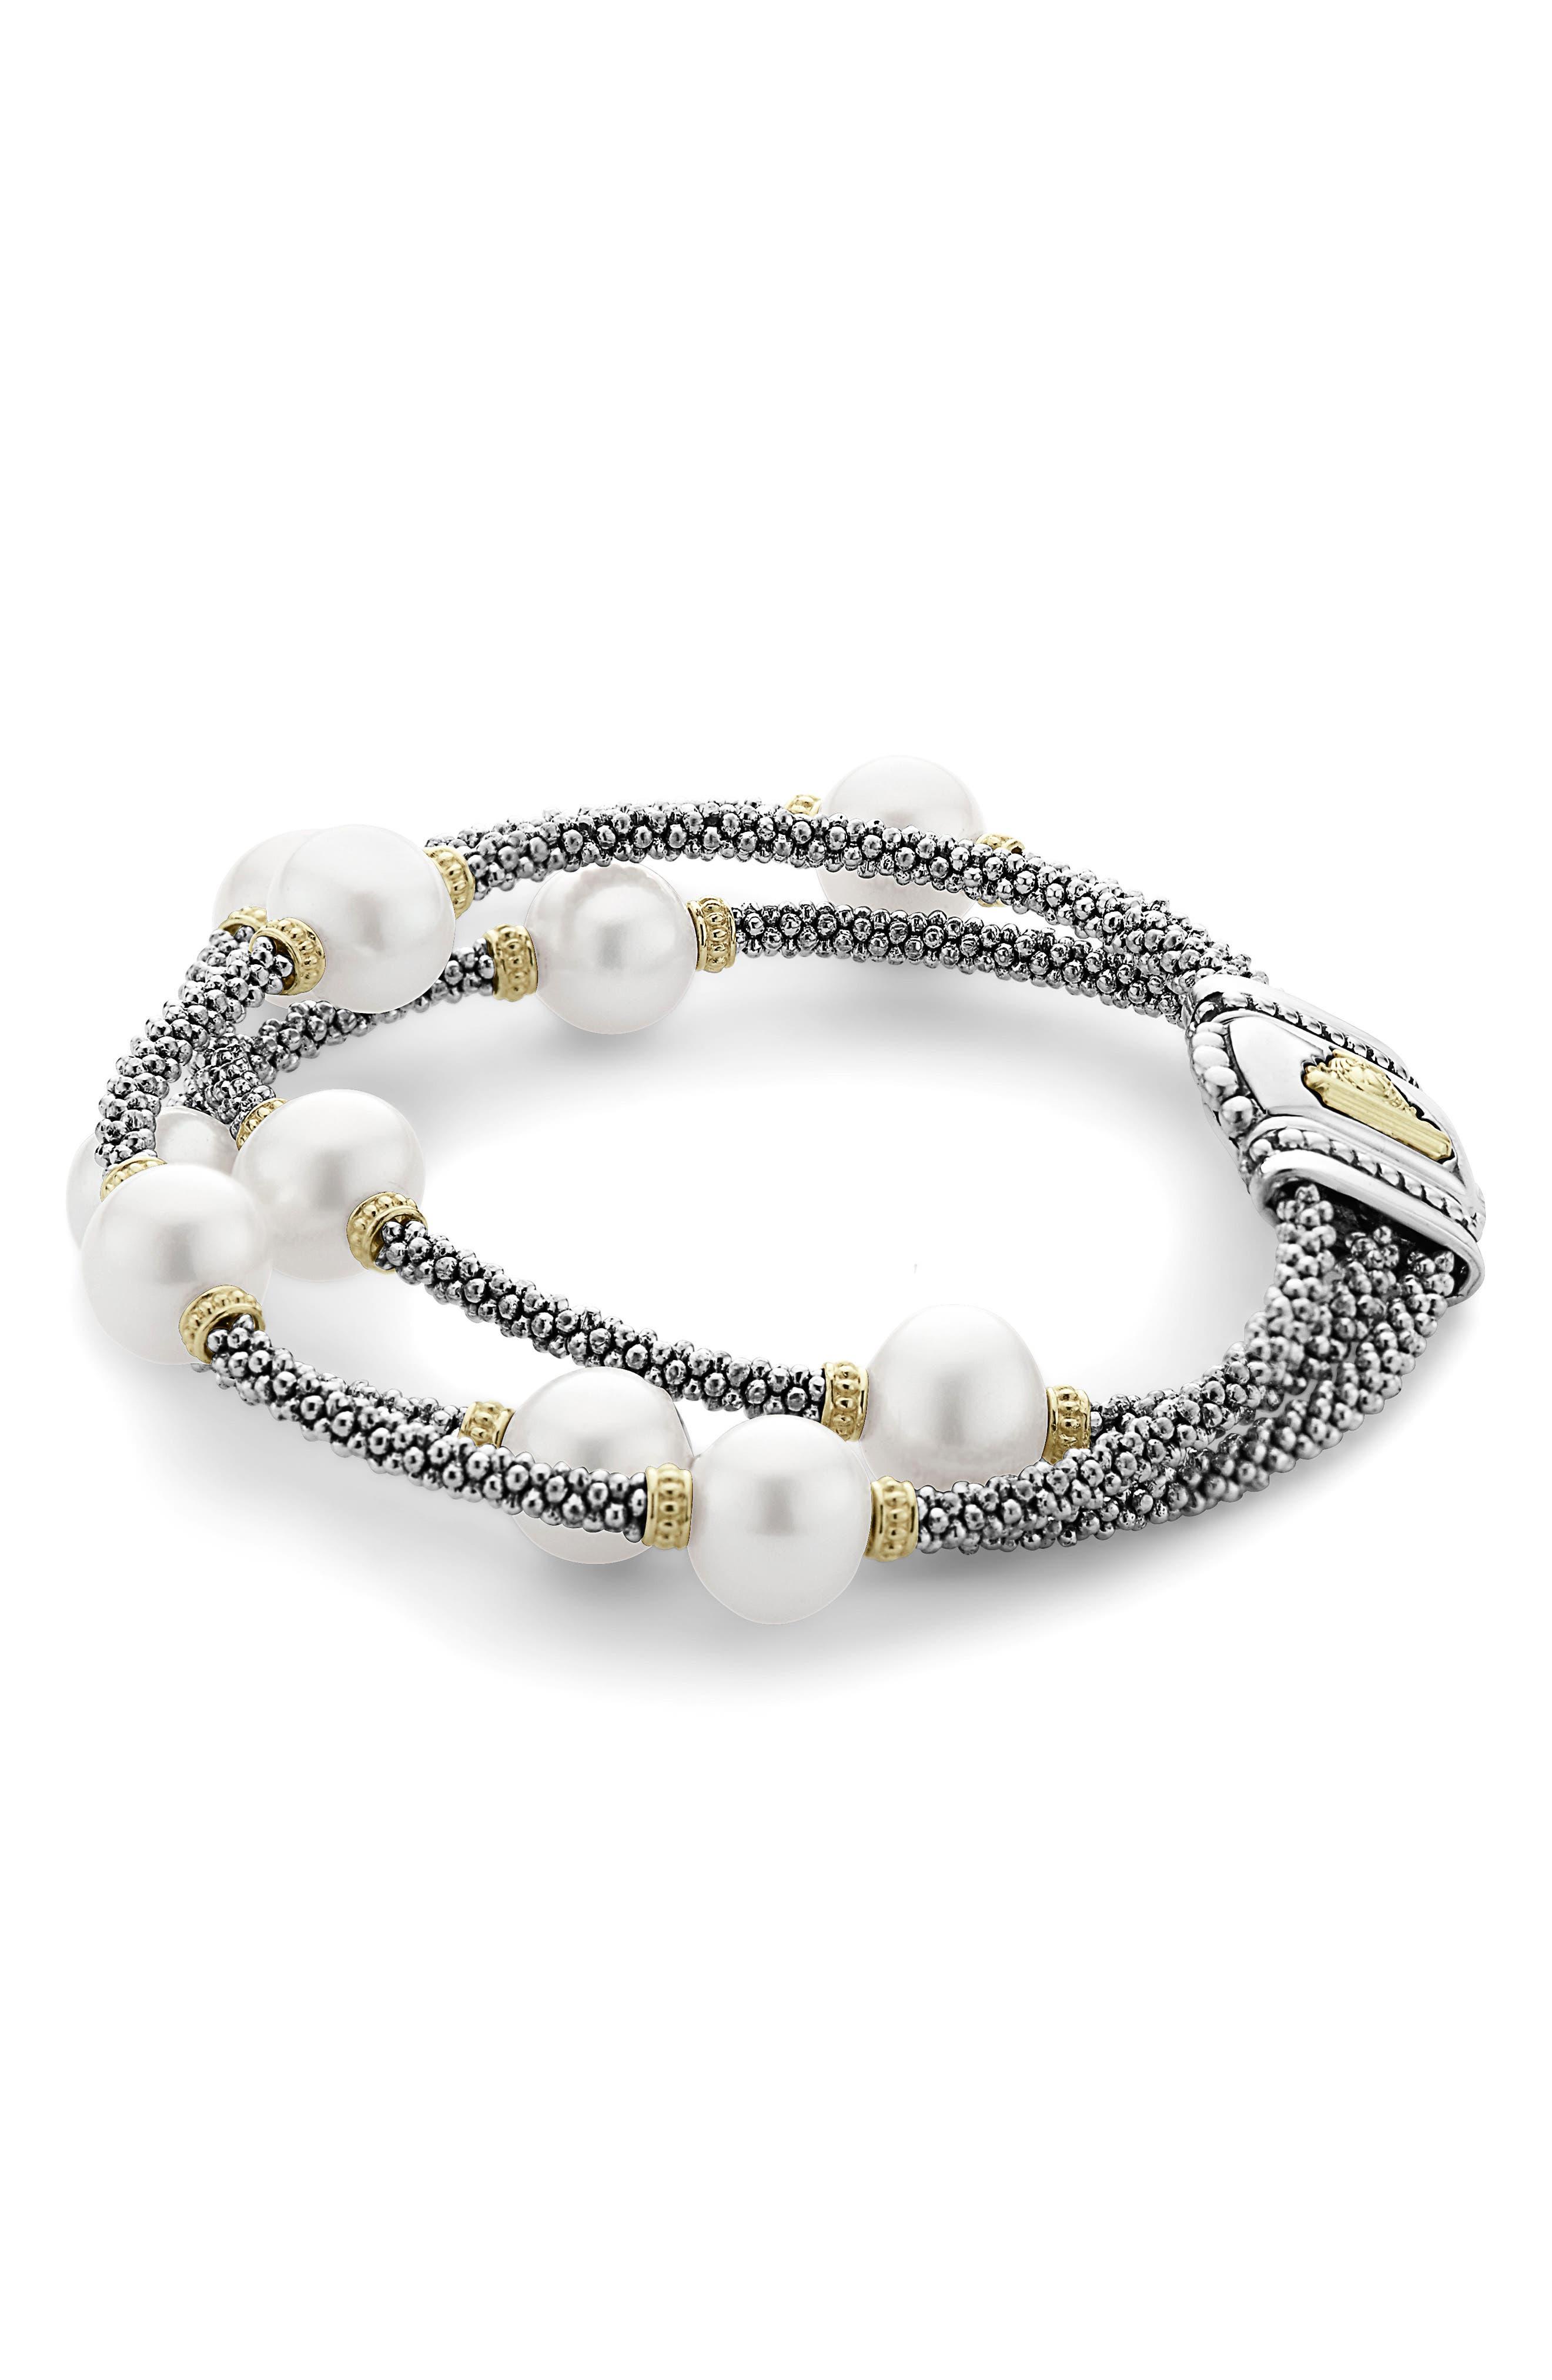 Luna Pearl Caviar Multistrand Bracelet,                             Alternate thumbnail 3, color,